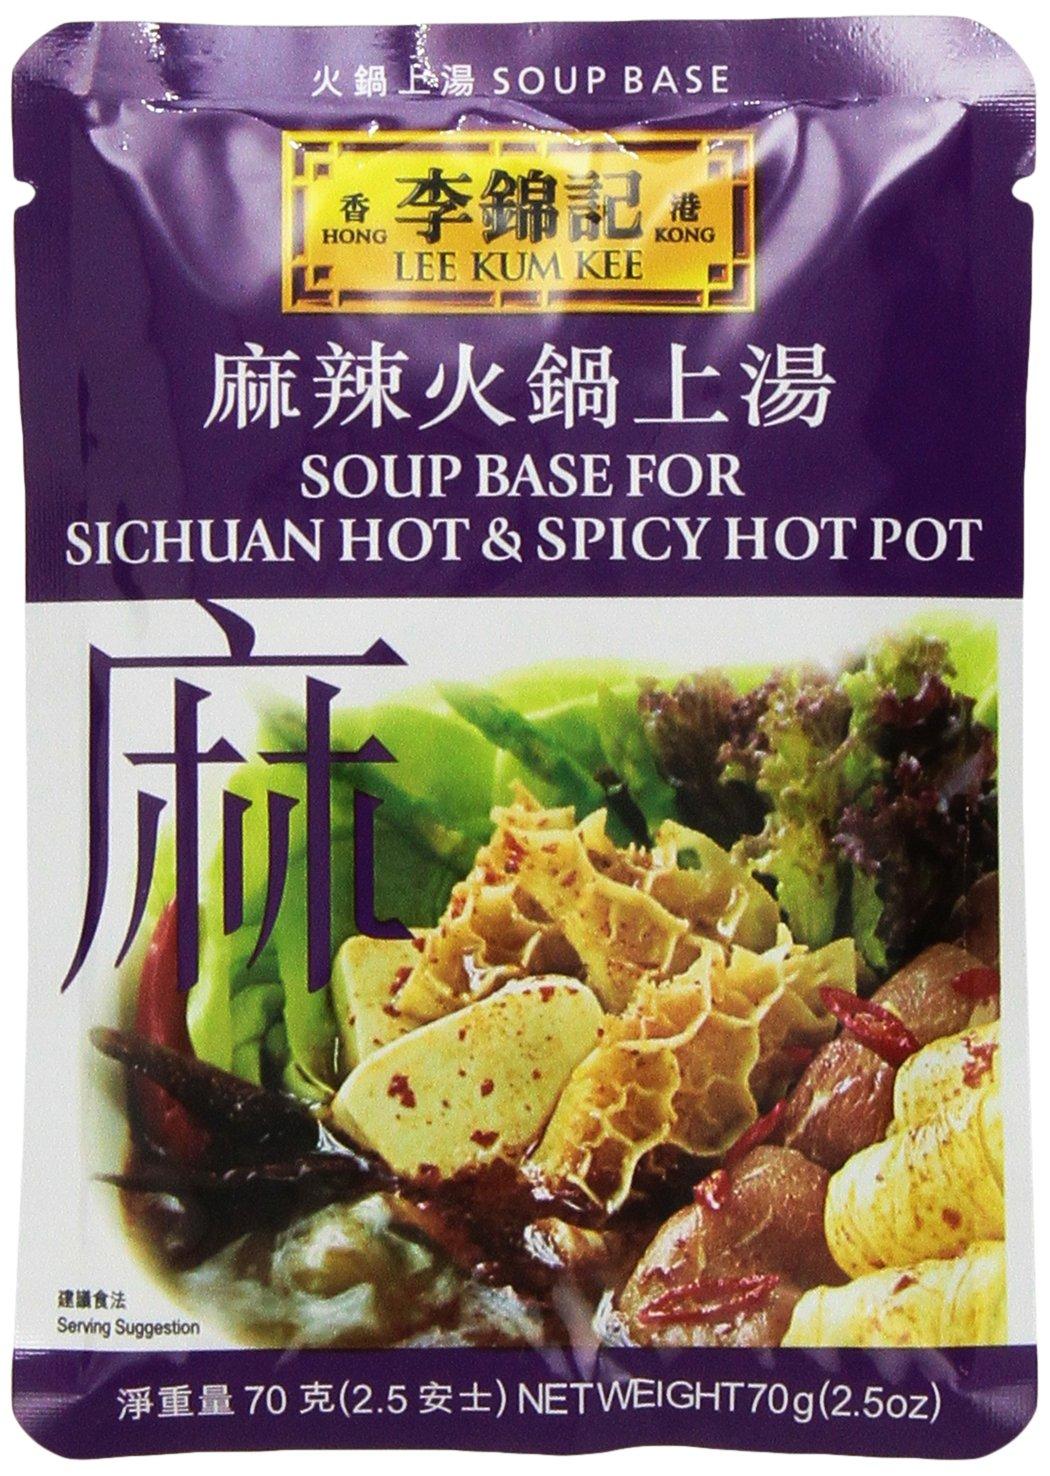 Yummy Garden Hot Pot Amazon little sheep hot pot soup base hot 235 grams pack soup base for sichuan hot spicy hot pot pack workwithnaturefo